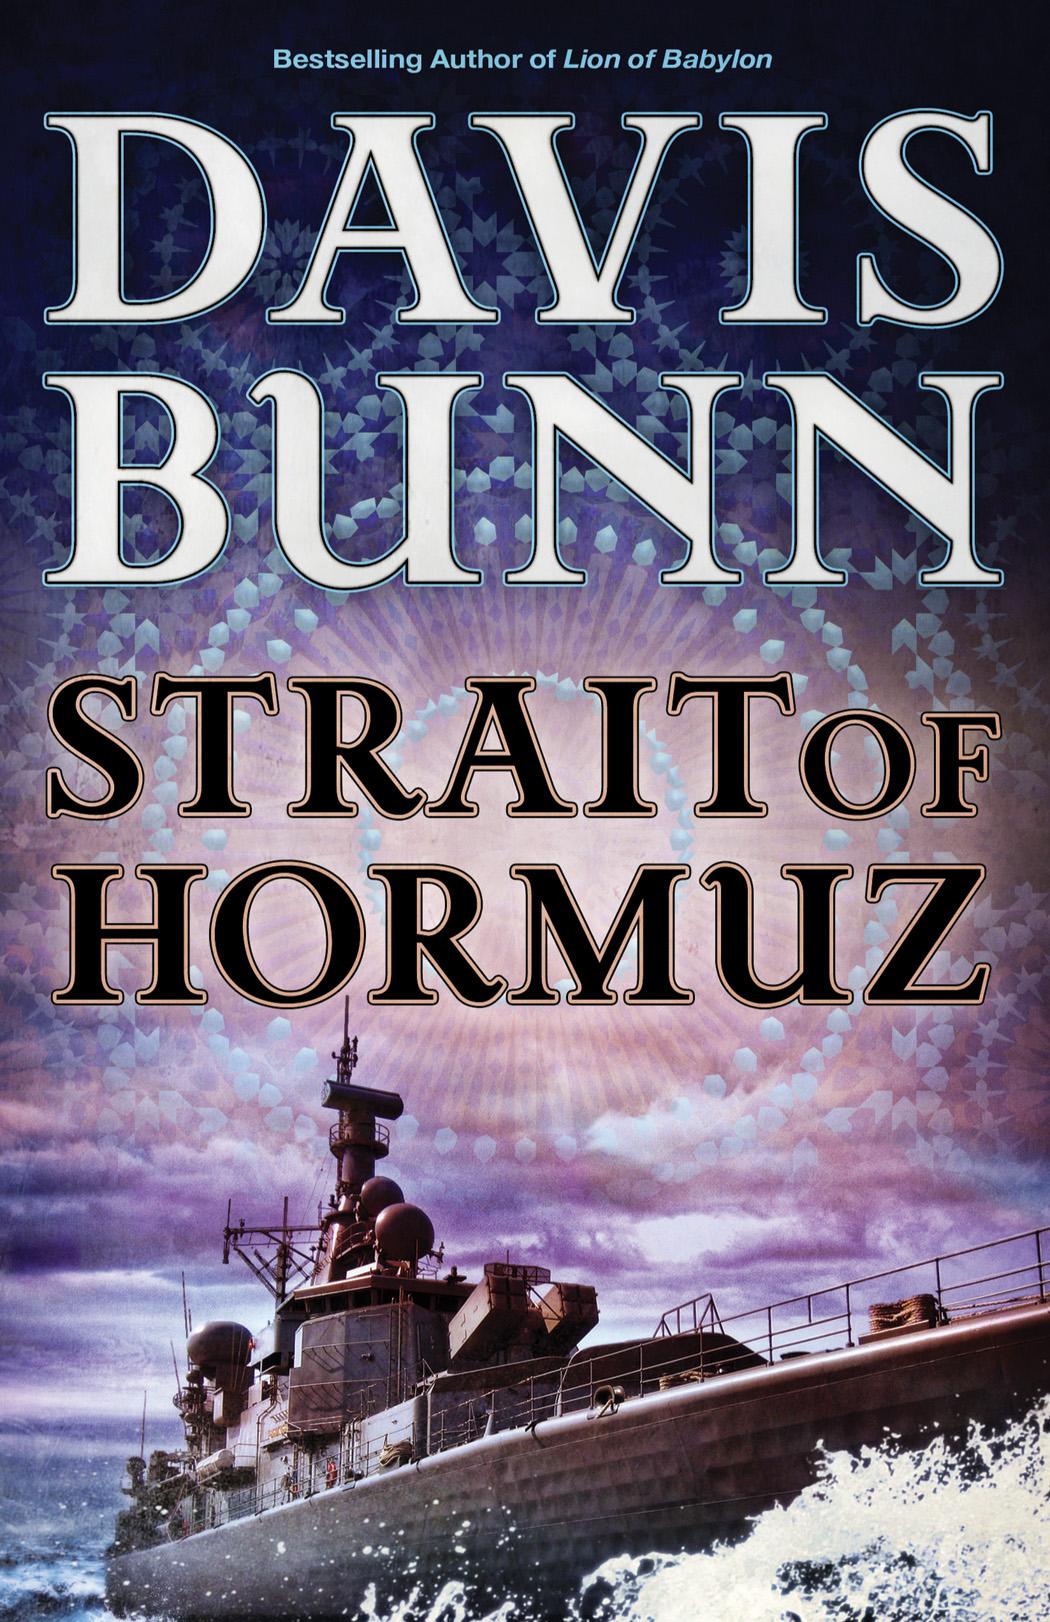 Book Review: Strait of Hormuz